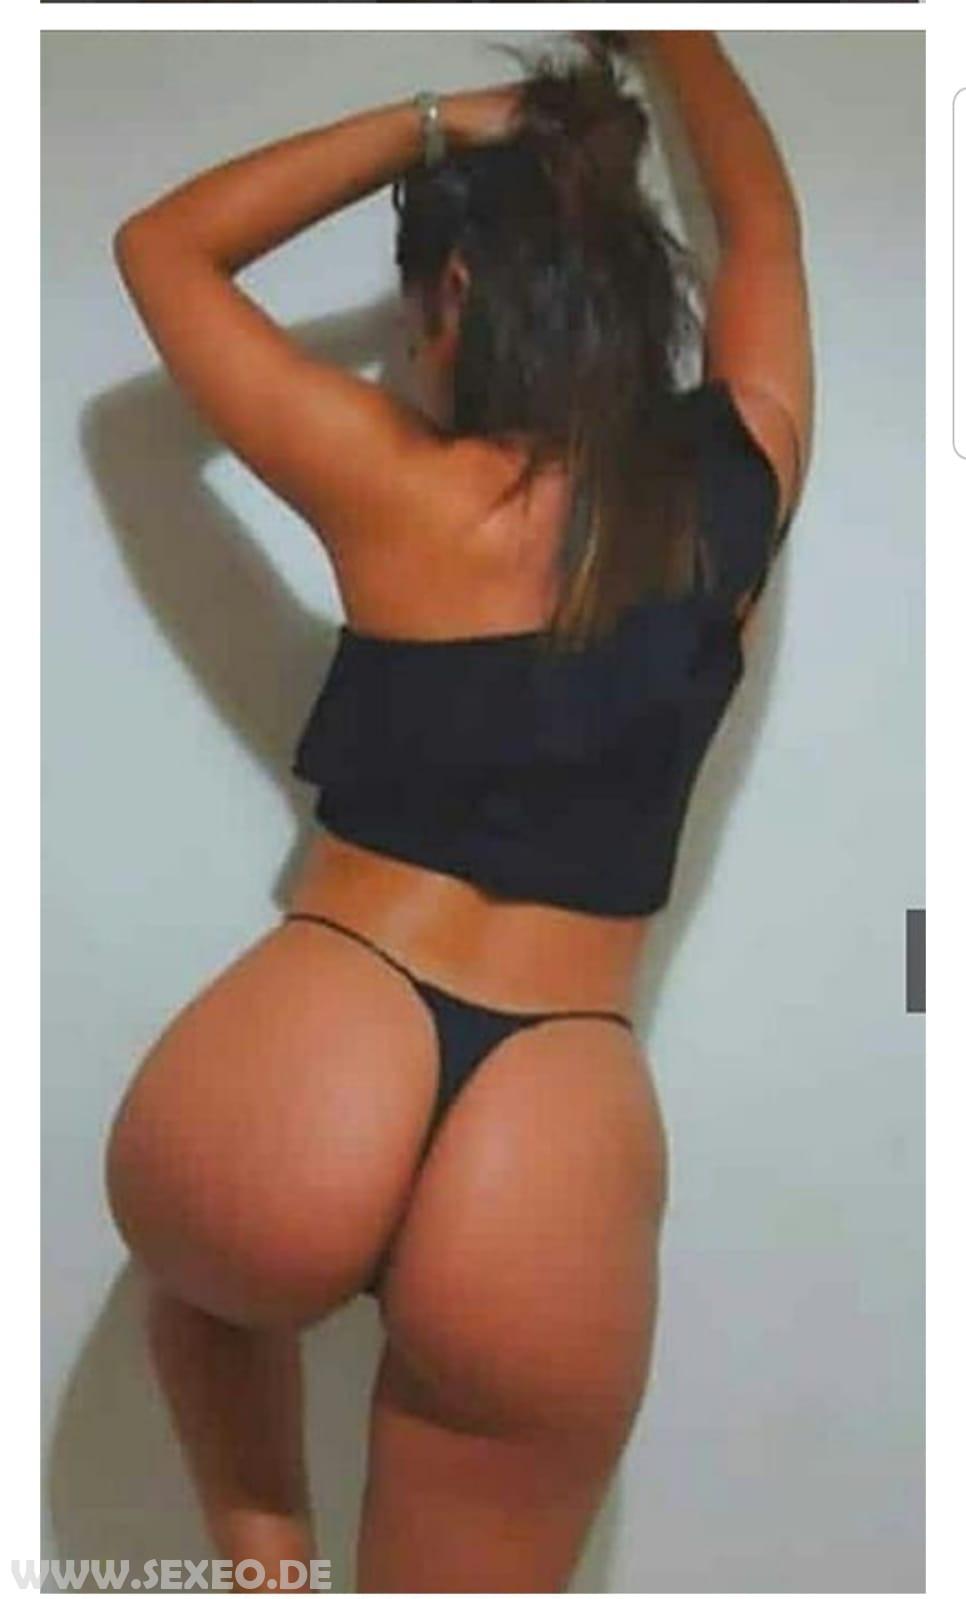 Lorena_1631546141991